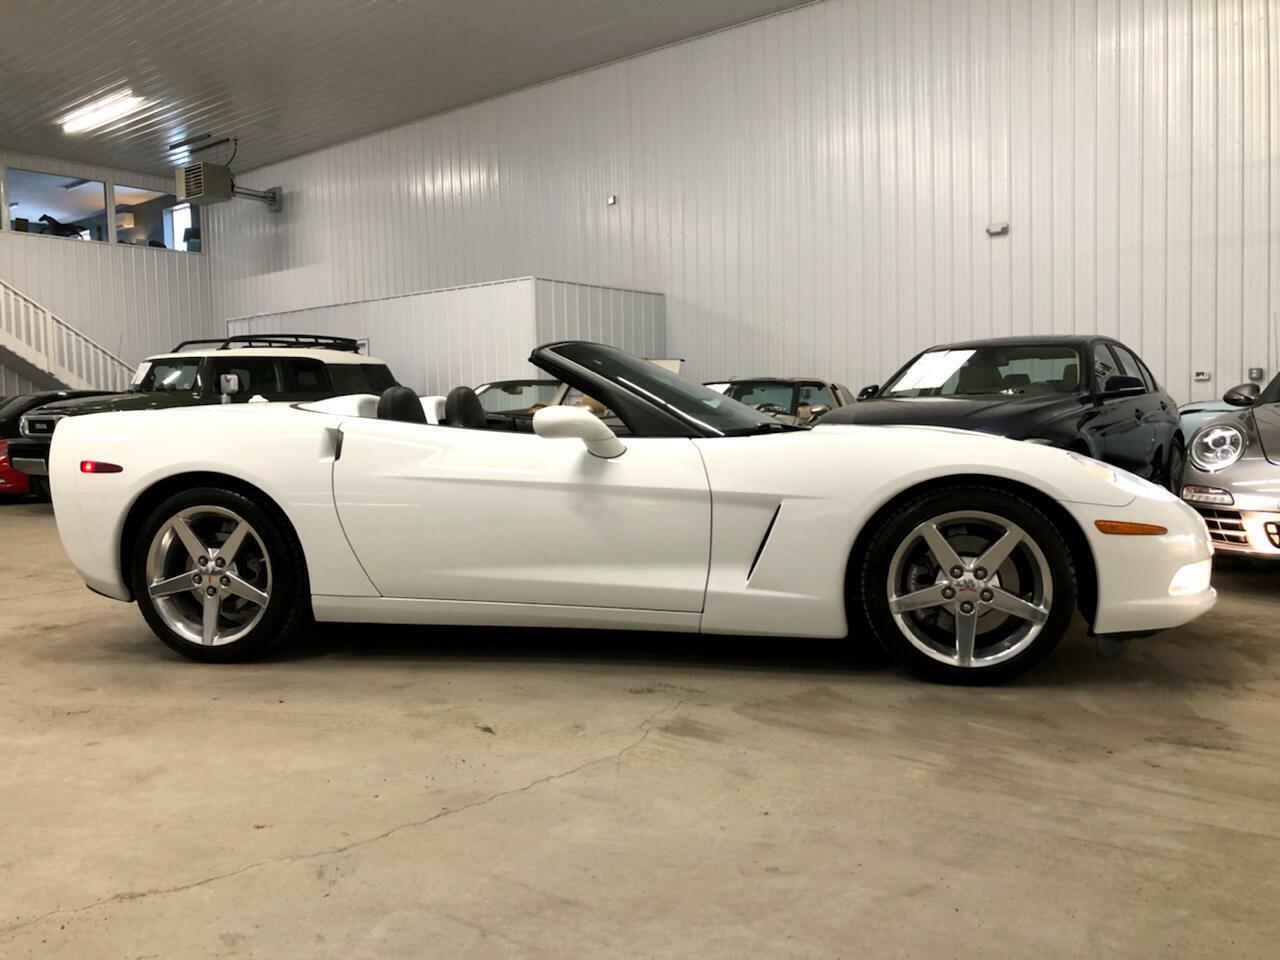 2005 White Chevrolet Corvette Convertible  | C6 Corvette Photo 2